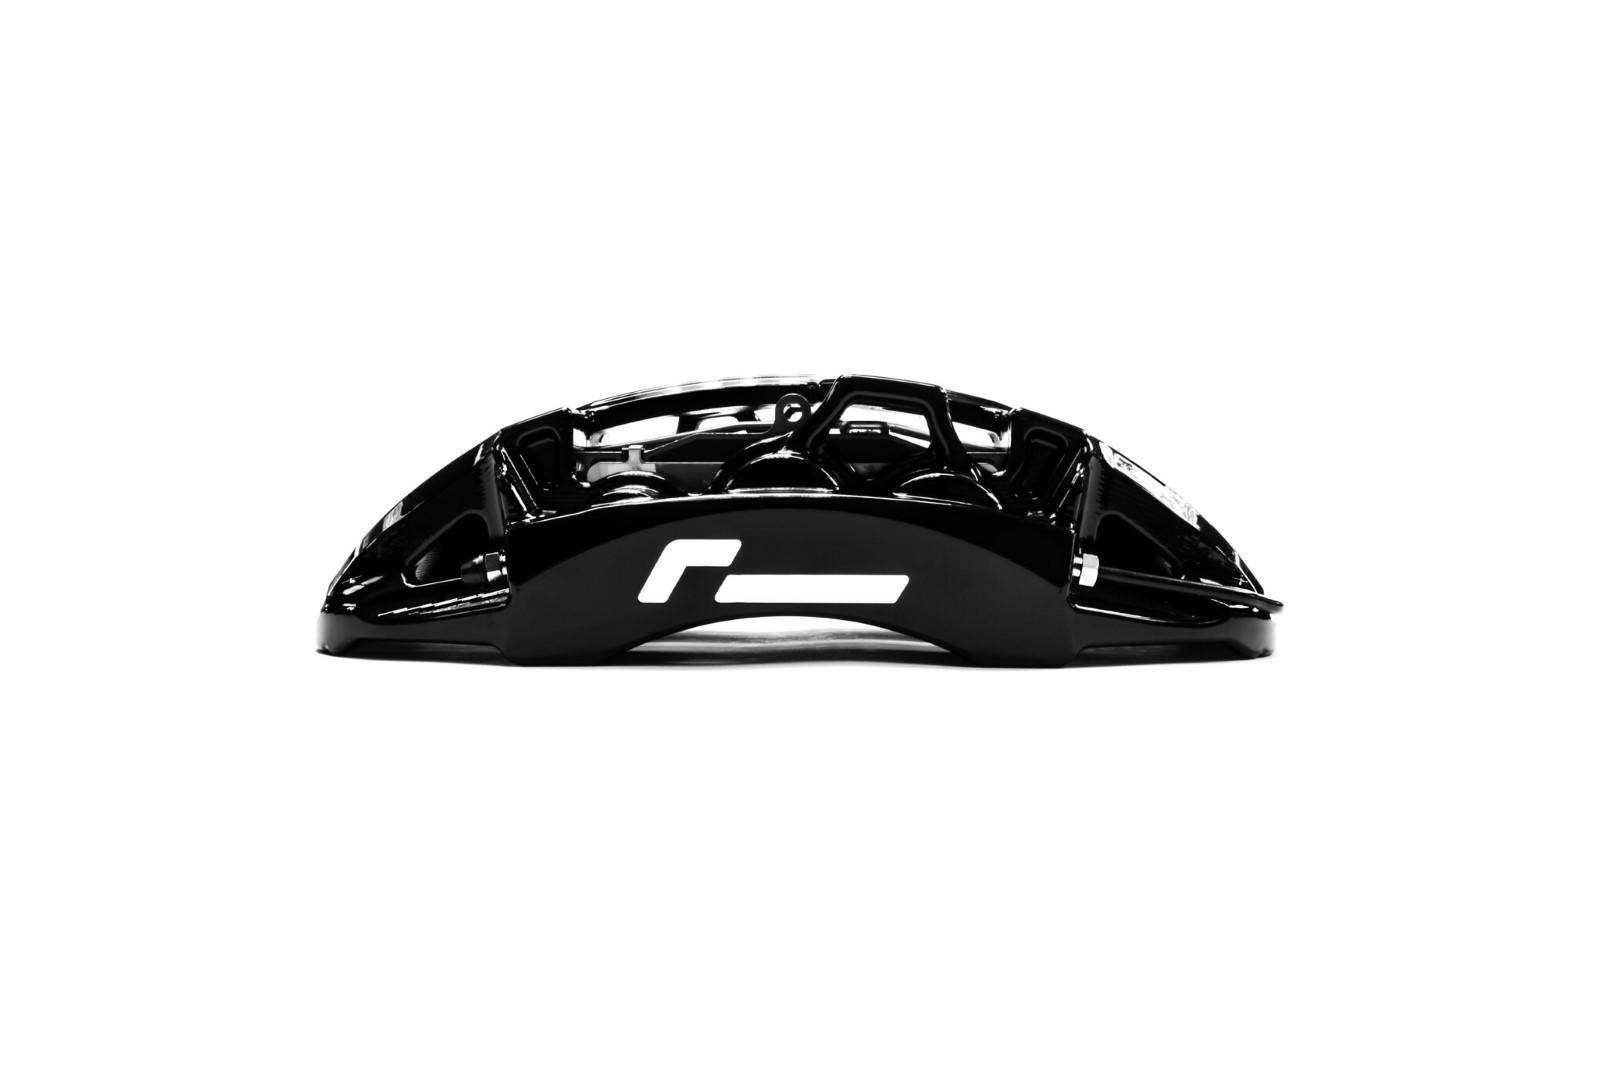 Racingline Performance Stage 3+ Carbon Ceramic Brake Kit 380mm MQB Cars VWR651000-BLK